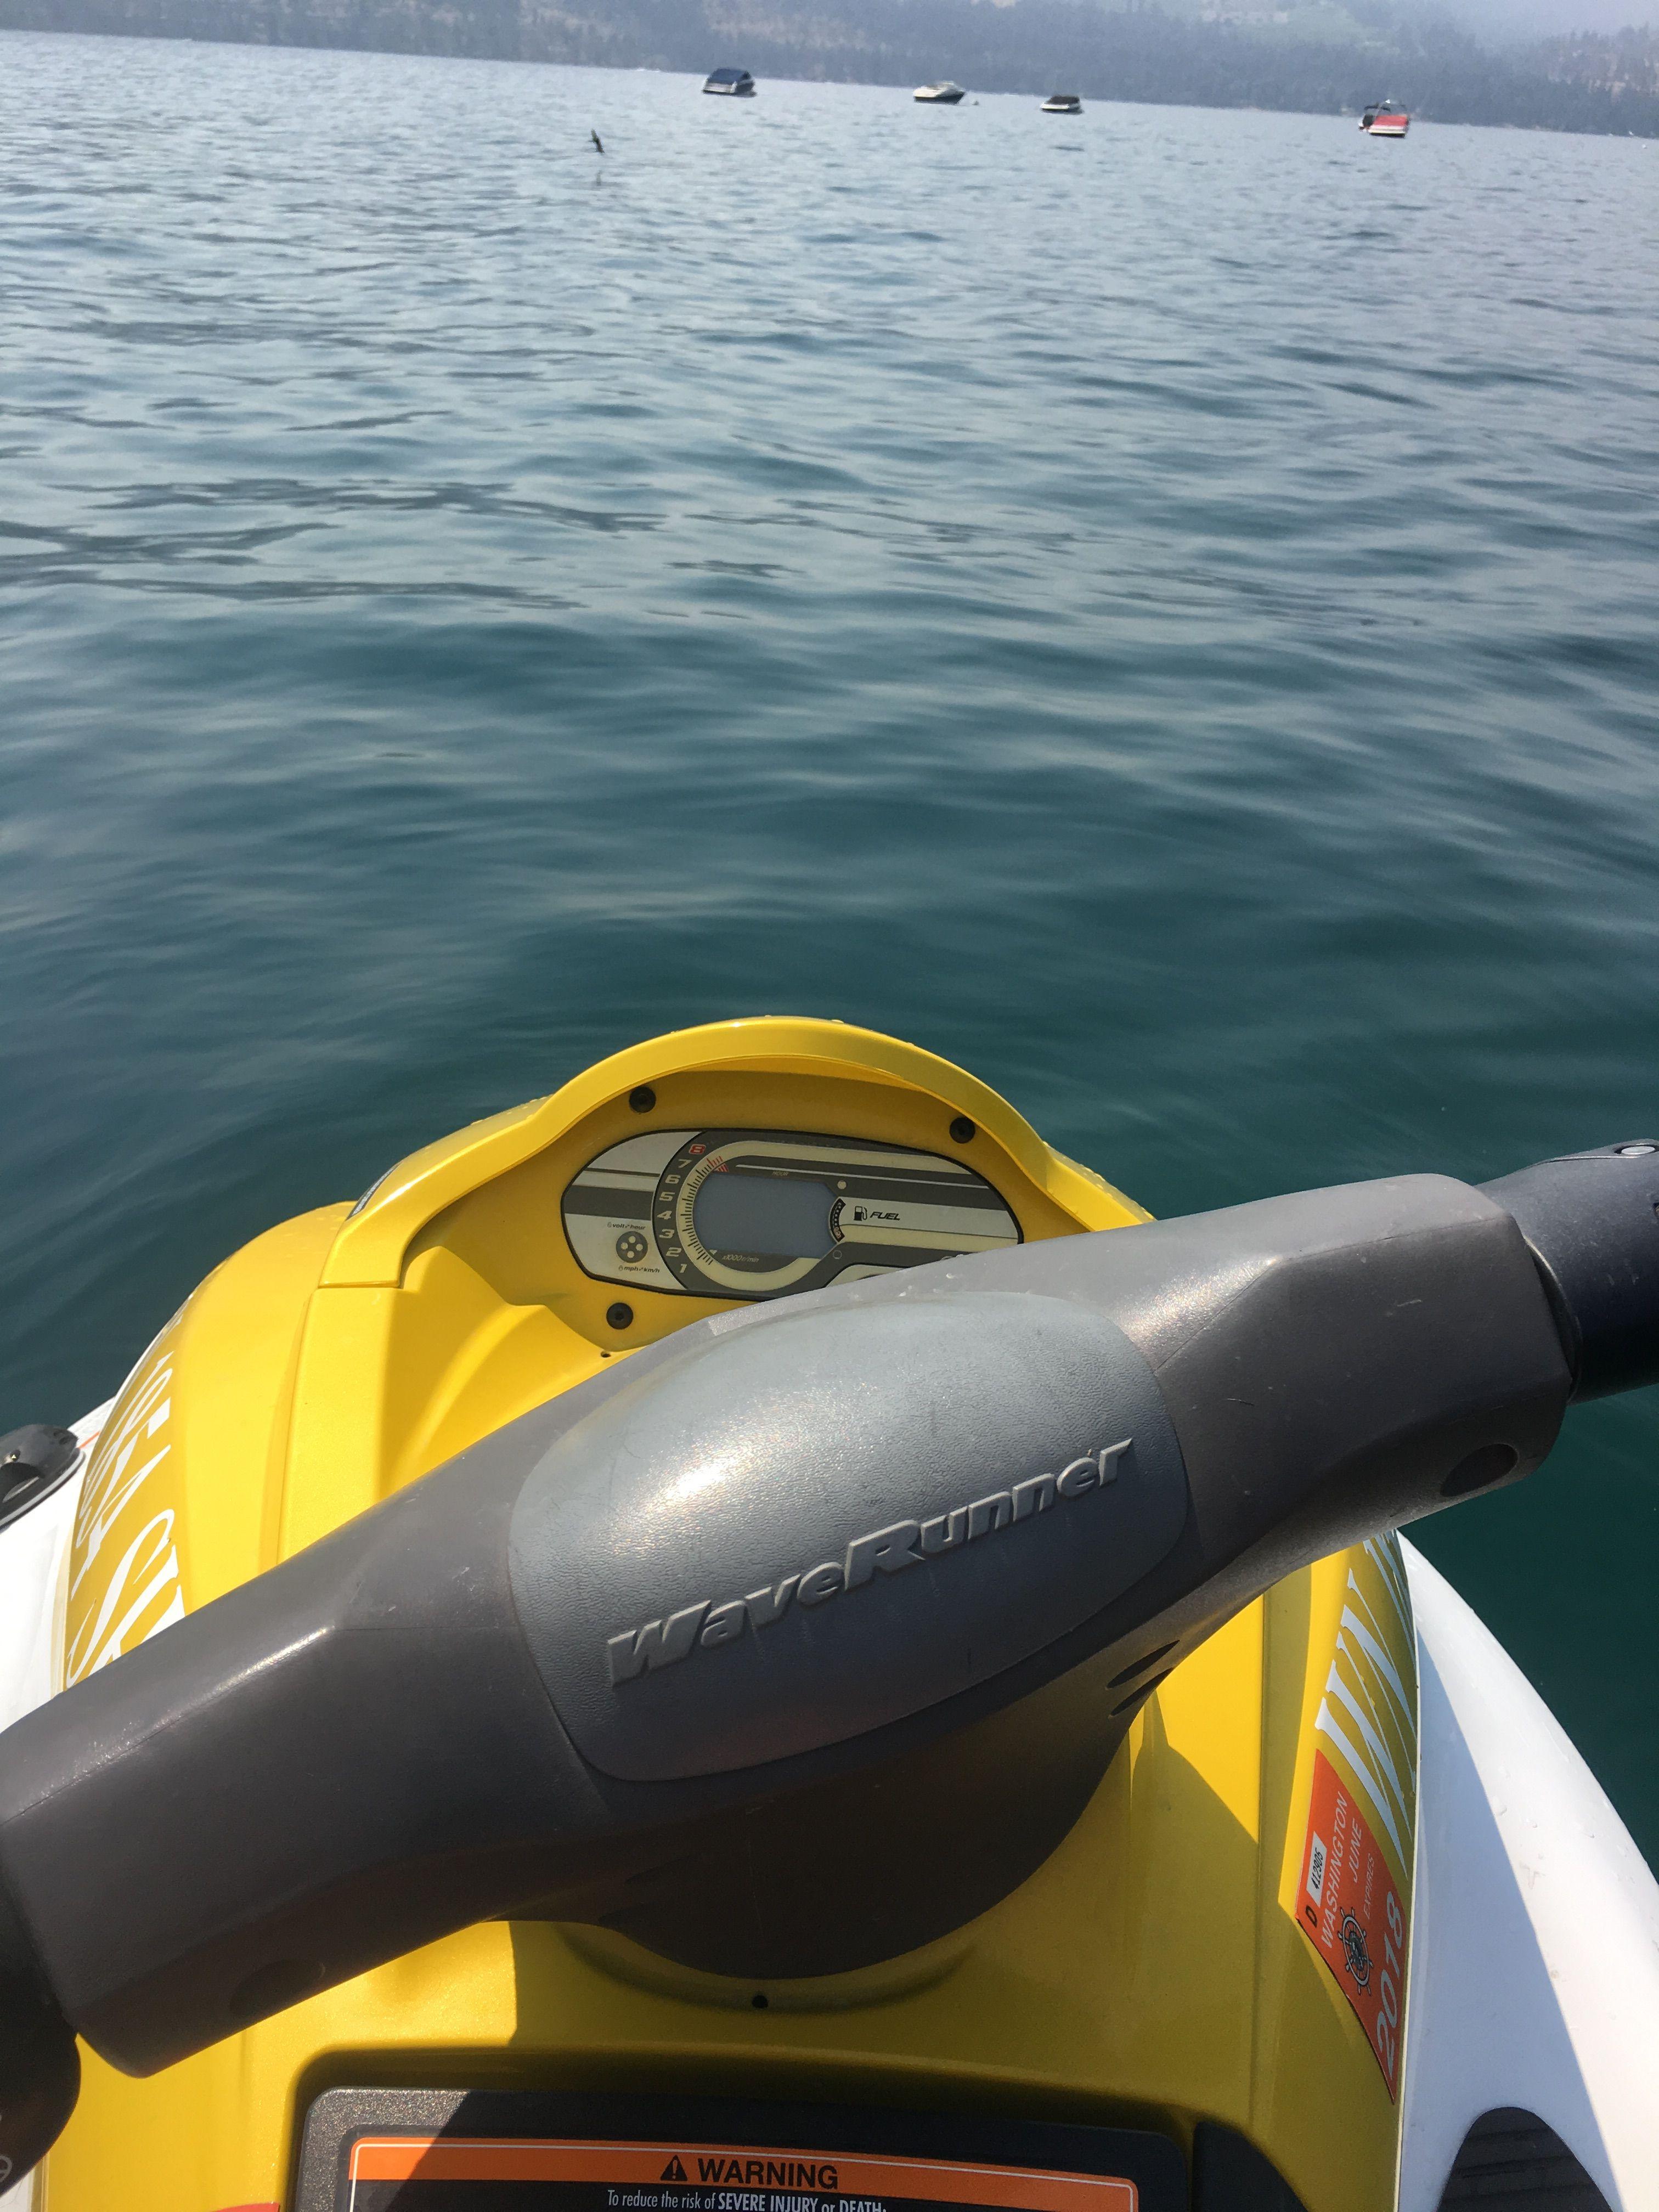 Best jet ski rentals on lake chelan shoreline watercraft